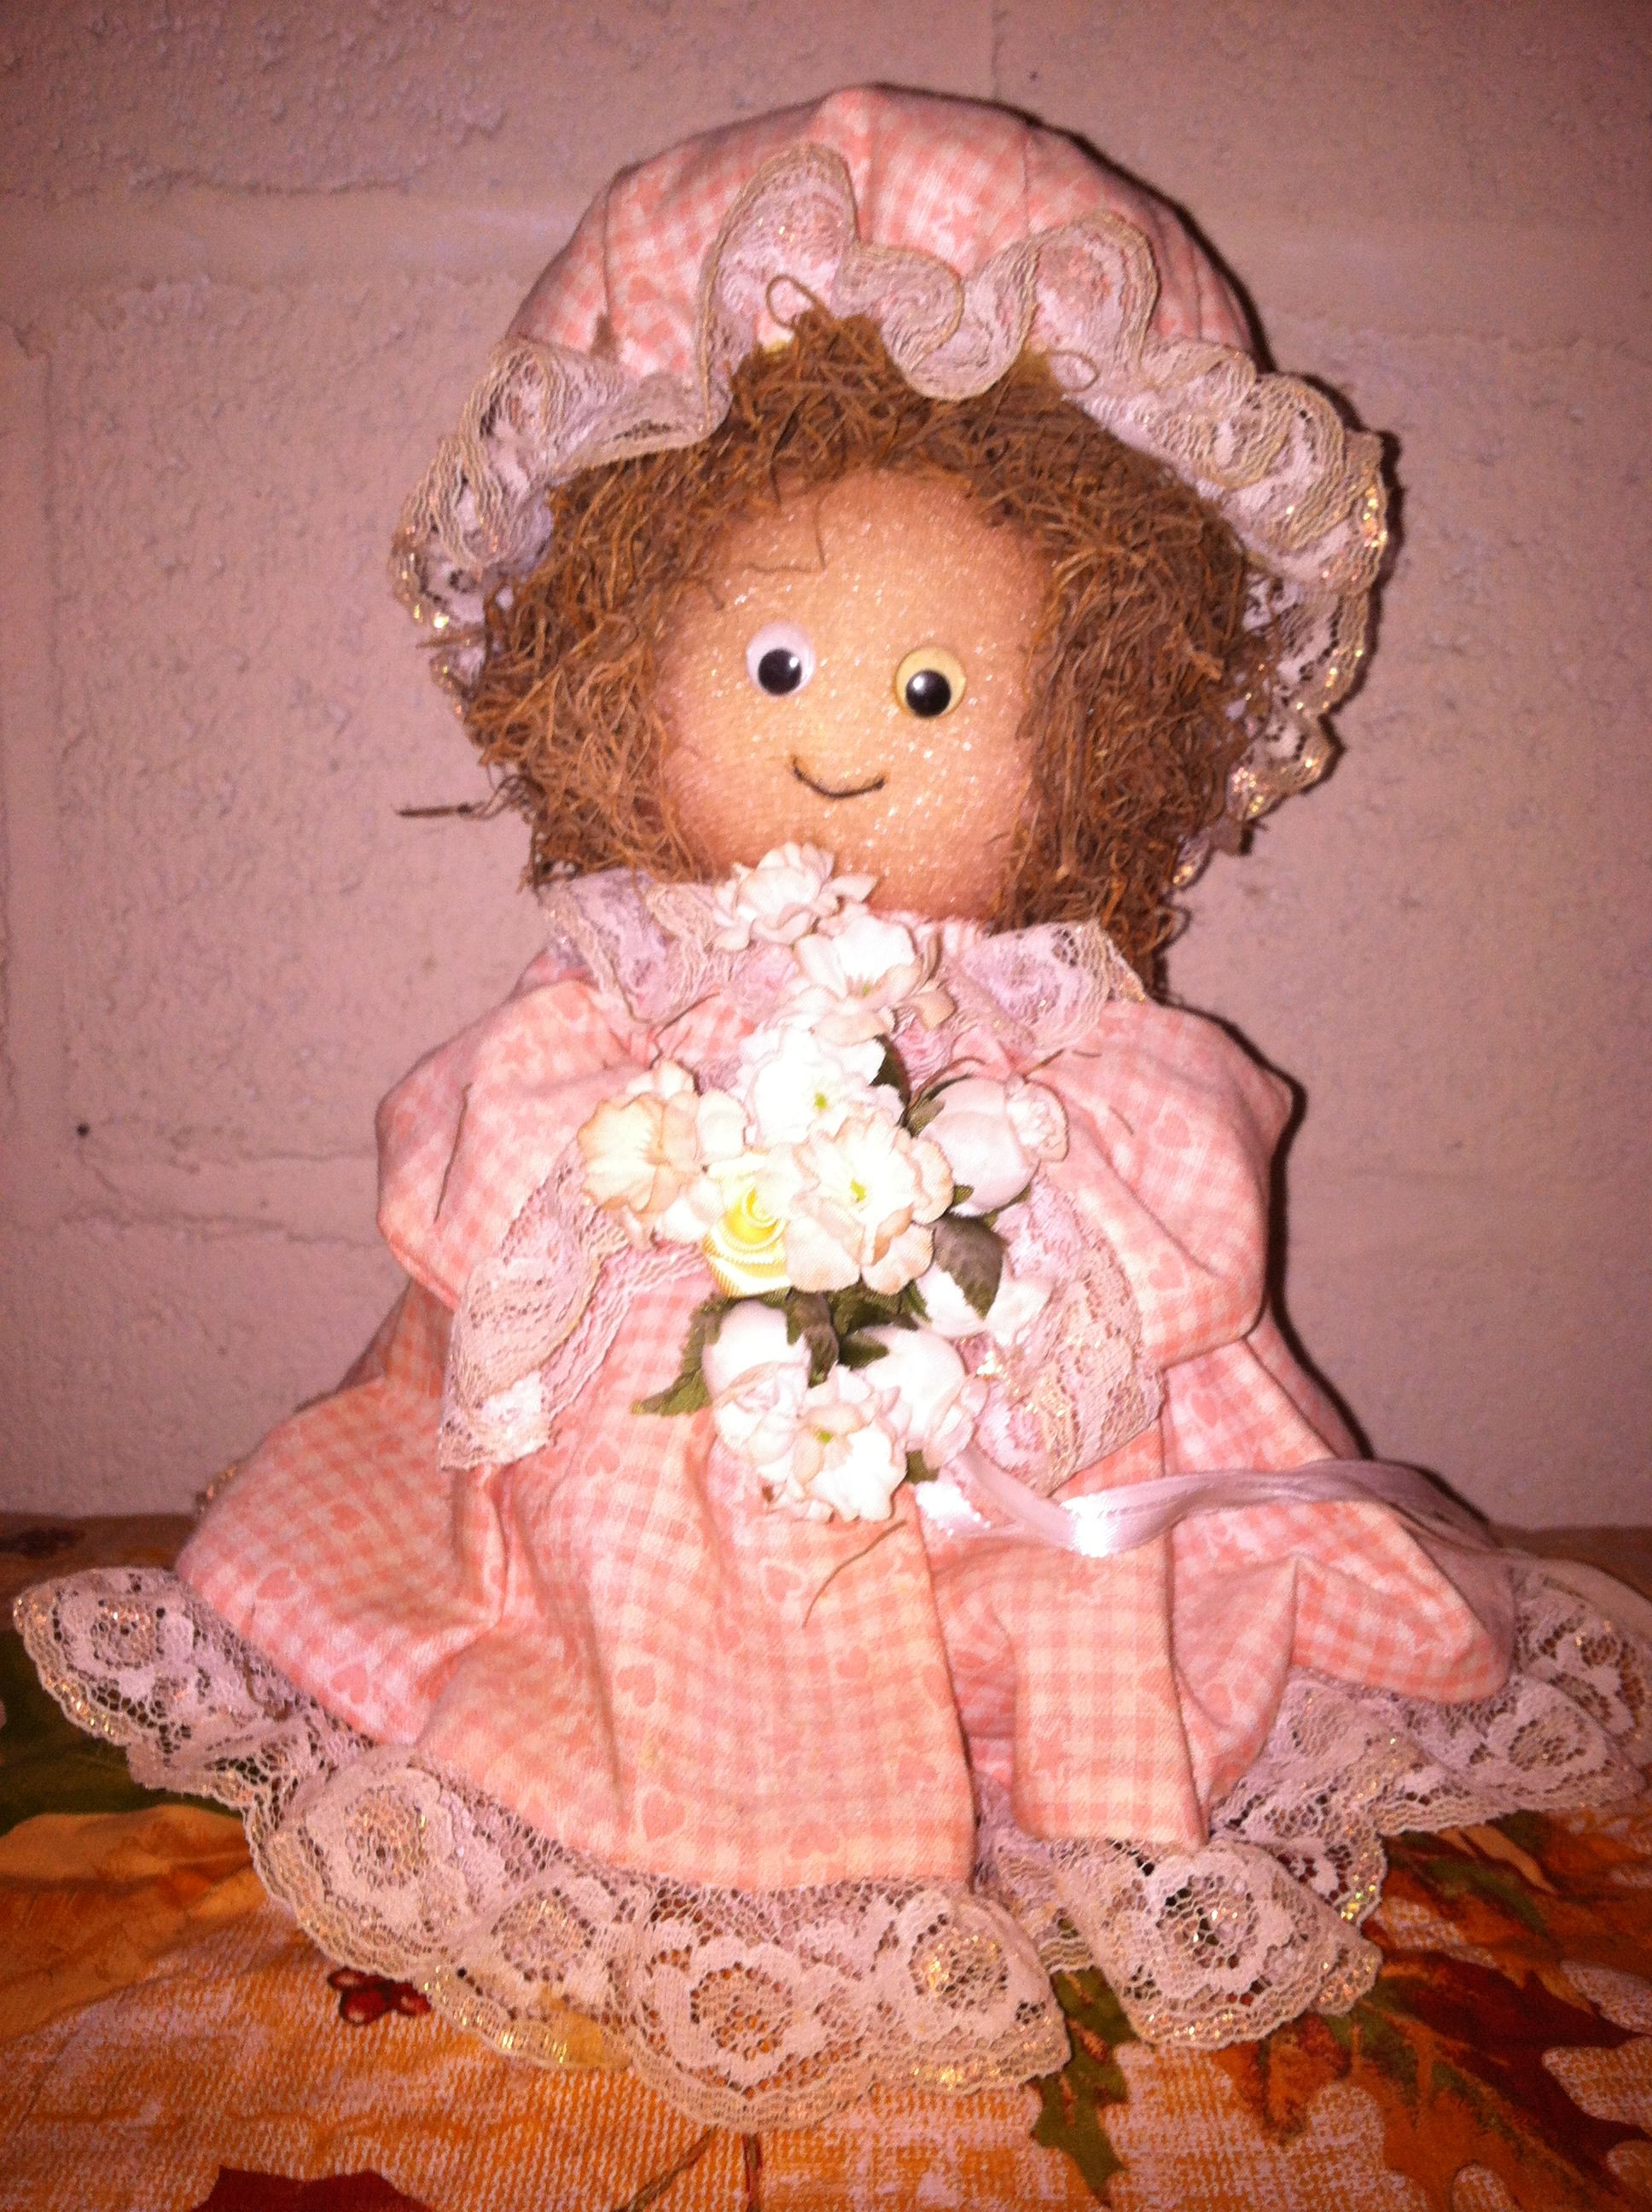 Renuzit air freshener doll 1 #airfreshnerdolls